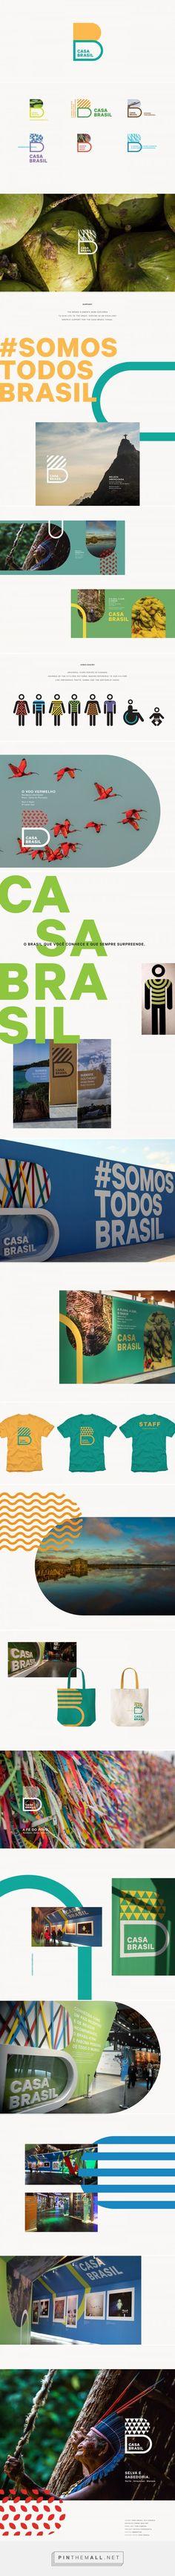 Casa Brasil on Behance - created on 2017-06-22 19:09:31